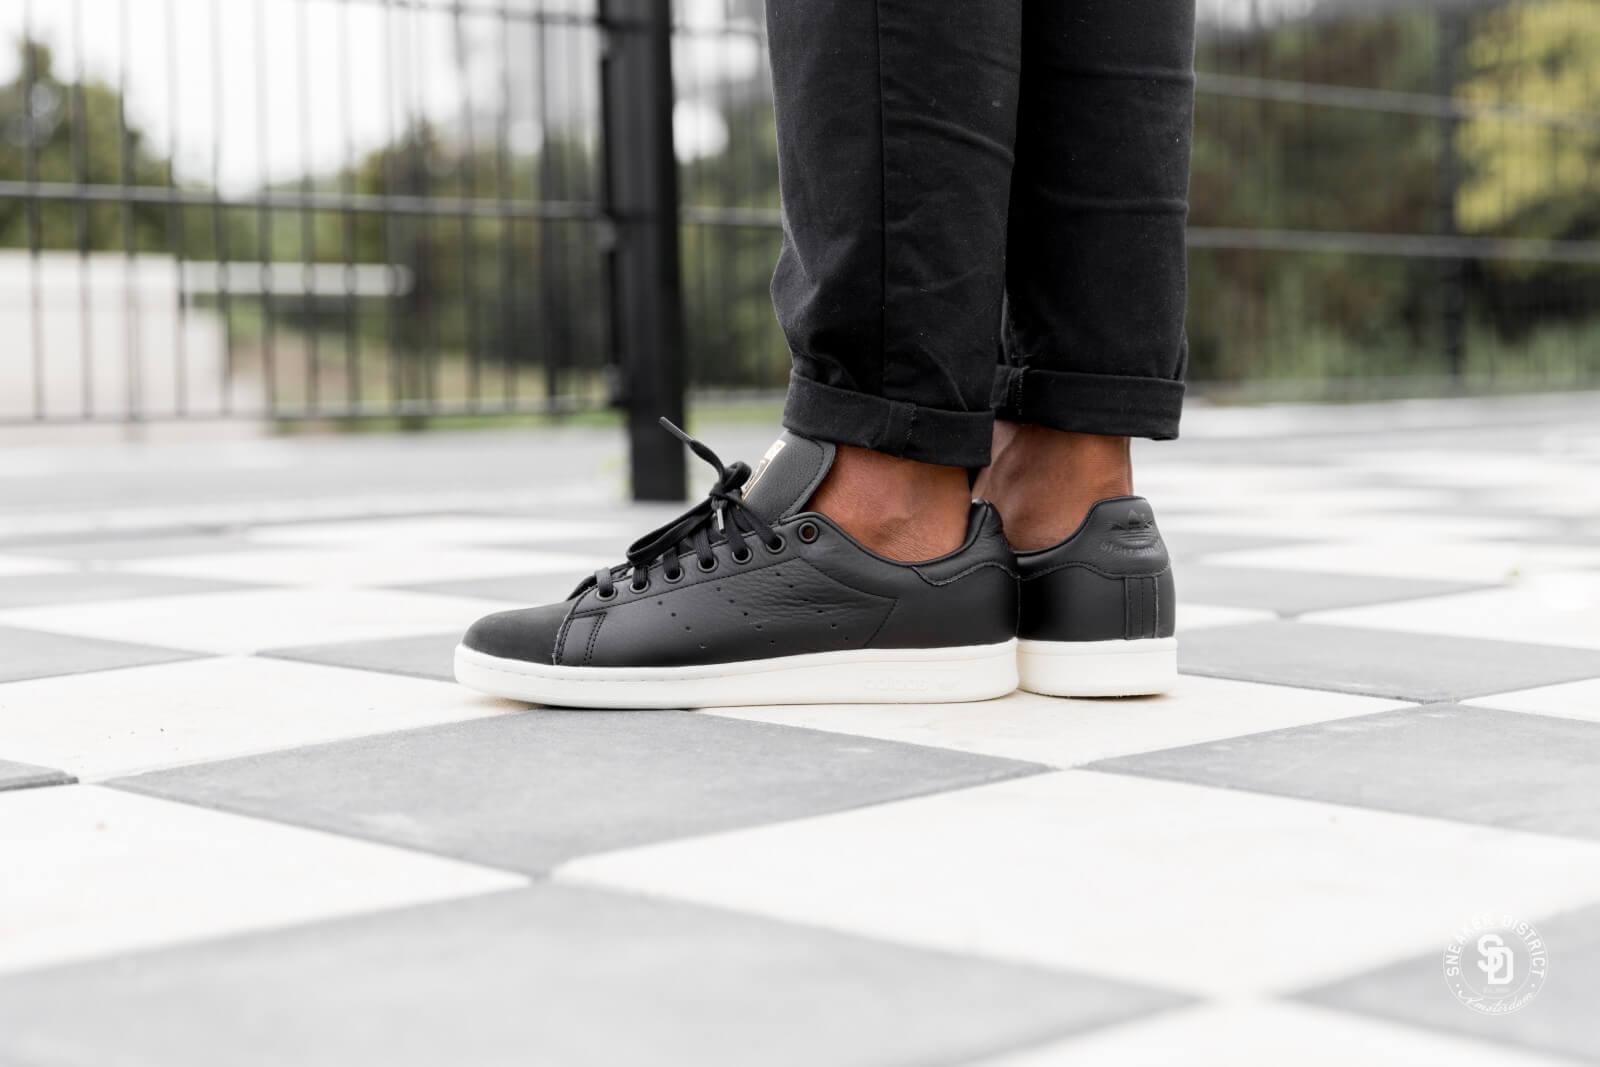 Adidas Stan Smith Premium Core BlackGold Metallic B37901